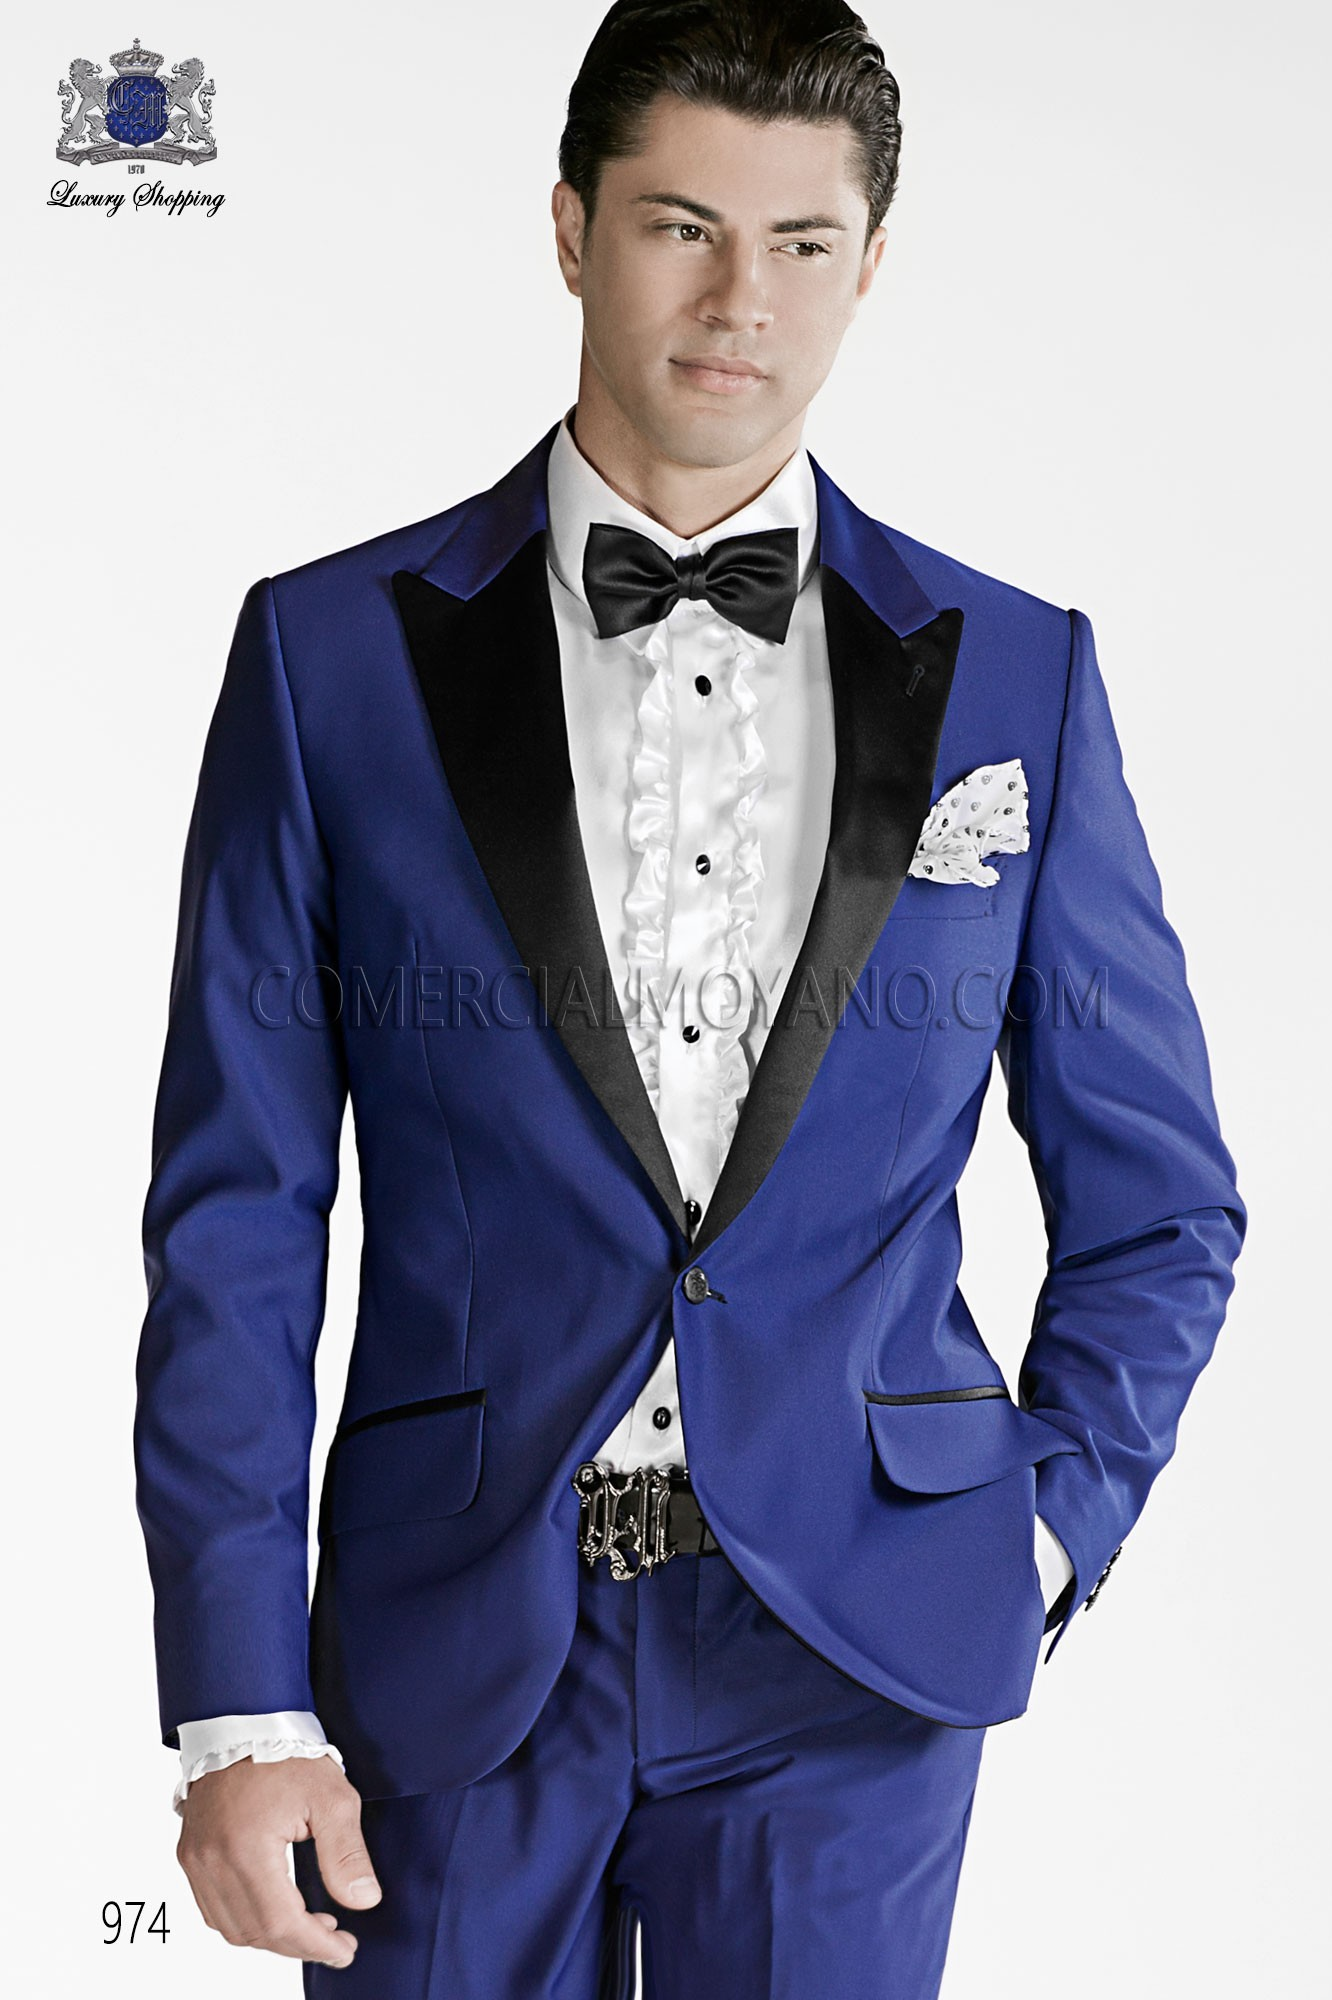 Traje de moda hombre azulon modelo: 974 Ottavio Nuccio Gala colección Emotion